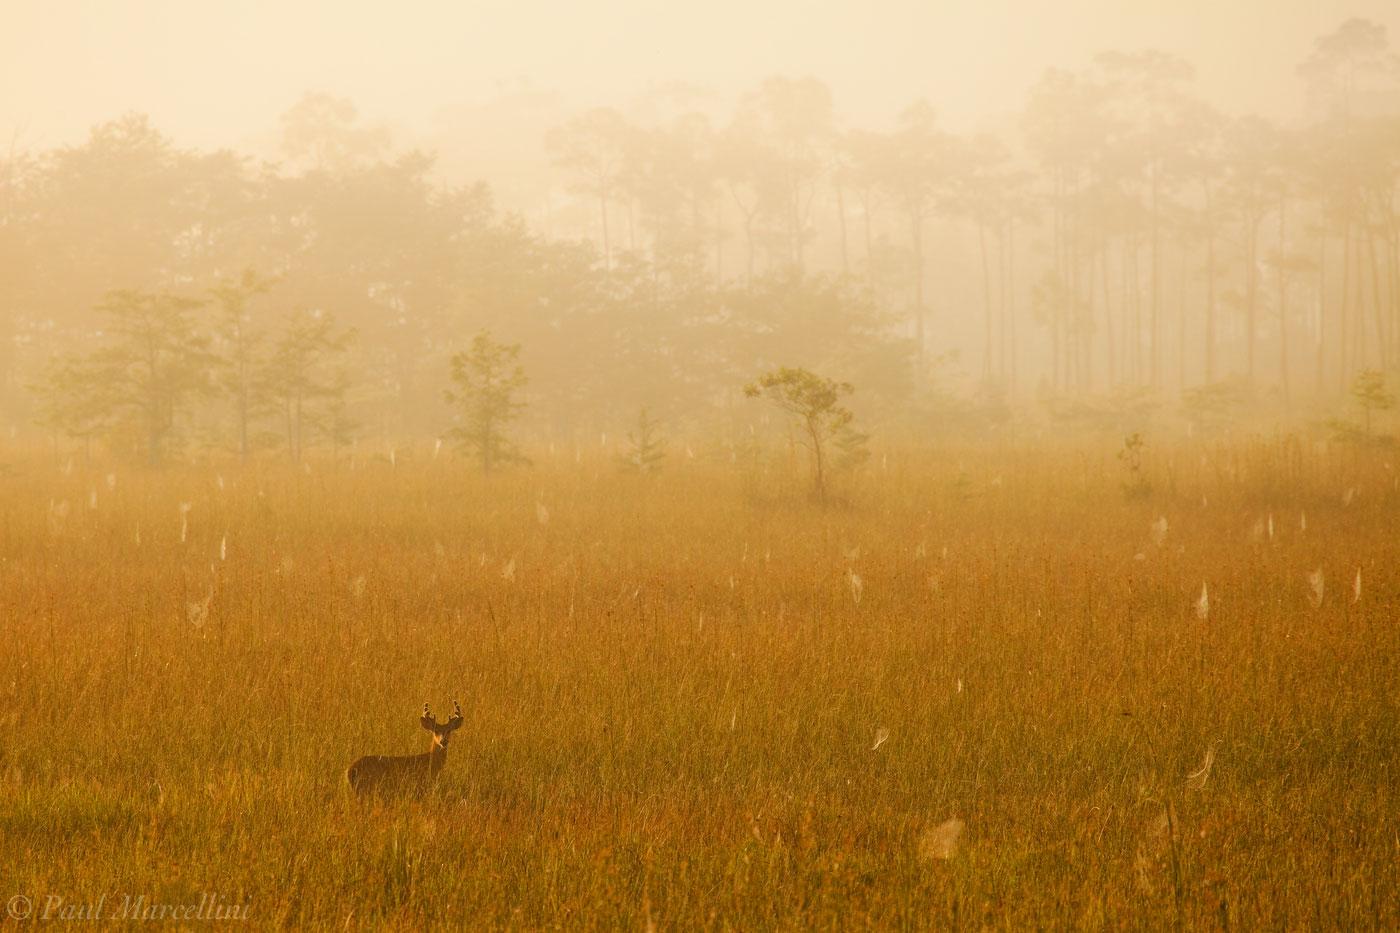 Odocoileus virginianus, white-tailed deer, everglades, spiderwebs, dew, fog, morning, deer, photo